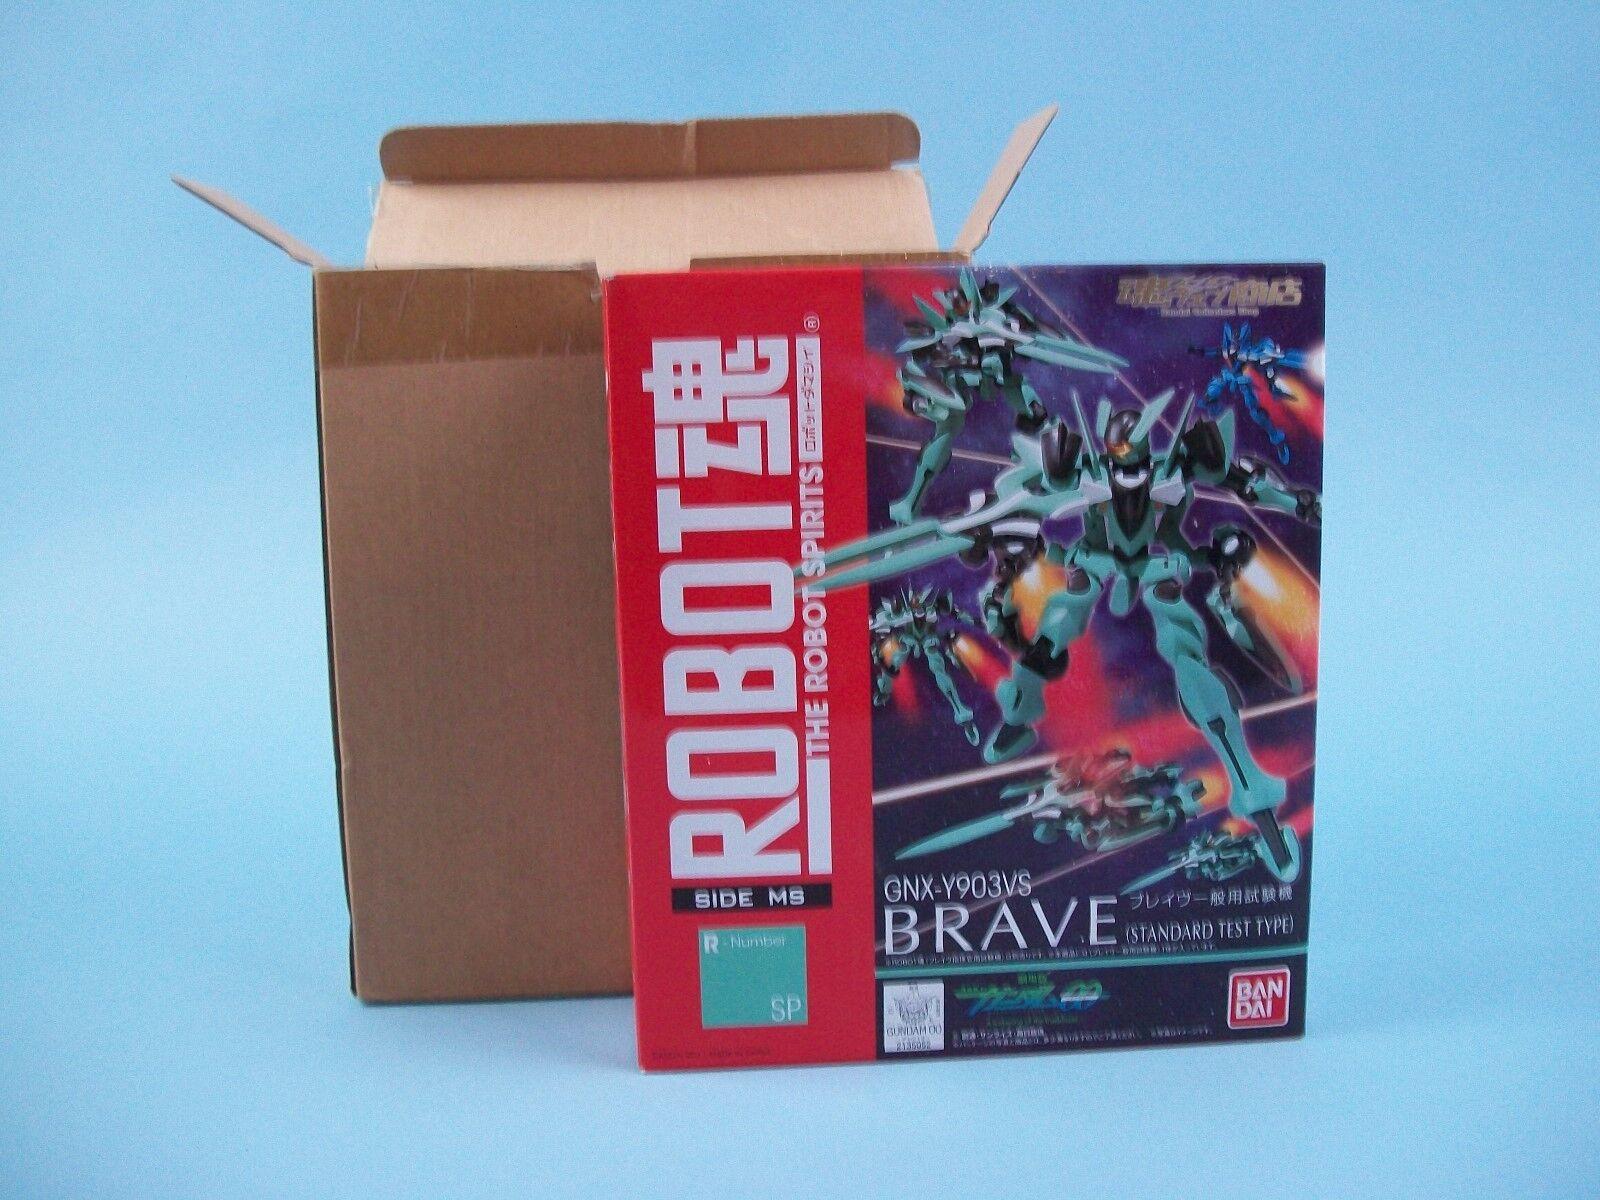 Gundam The Robot Spirits GNX-Y903VS Brave Test Type Figure Figure Figure R-Number SP Bandai 596f74